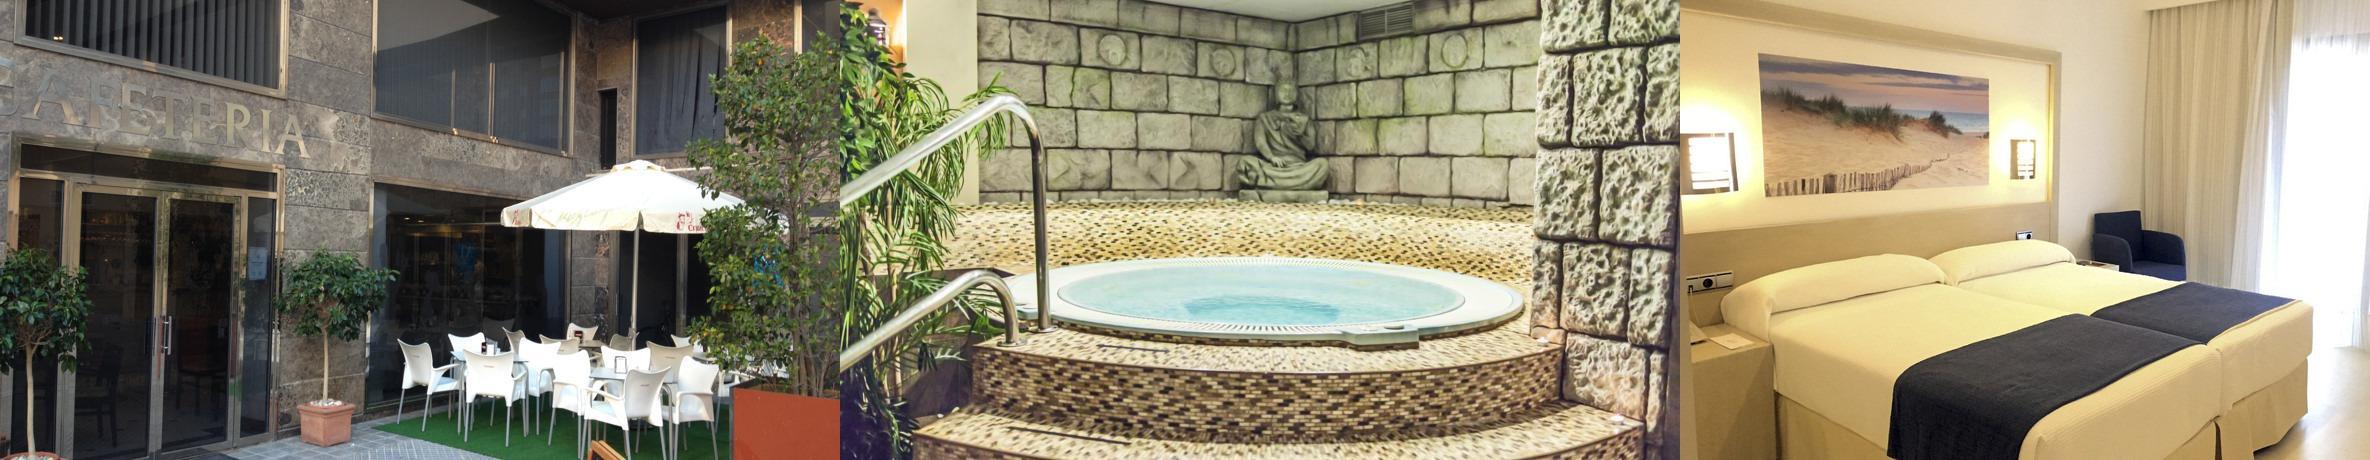 hotel-spa-cadiz-plaza